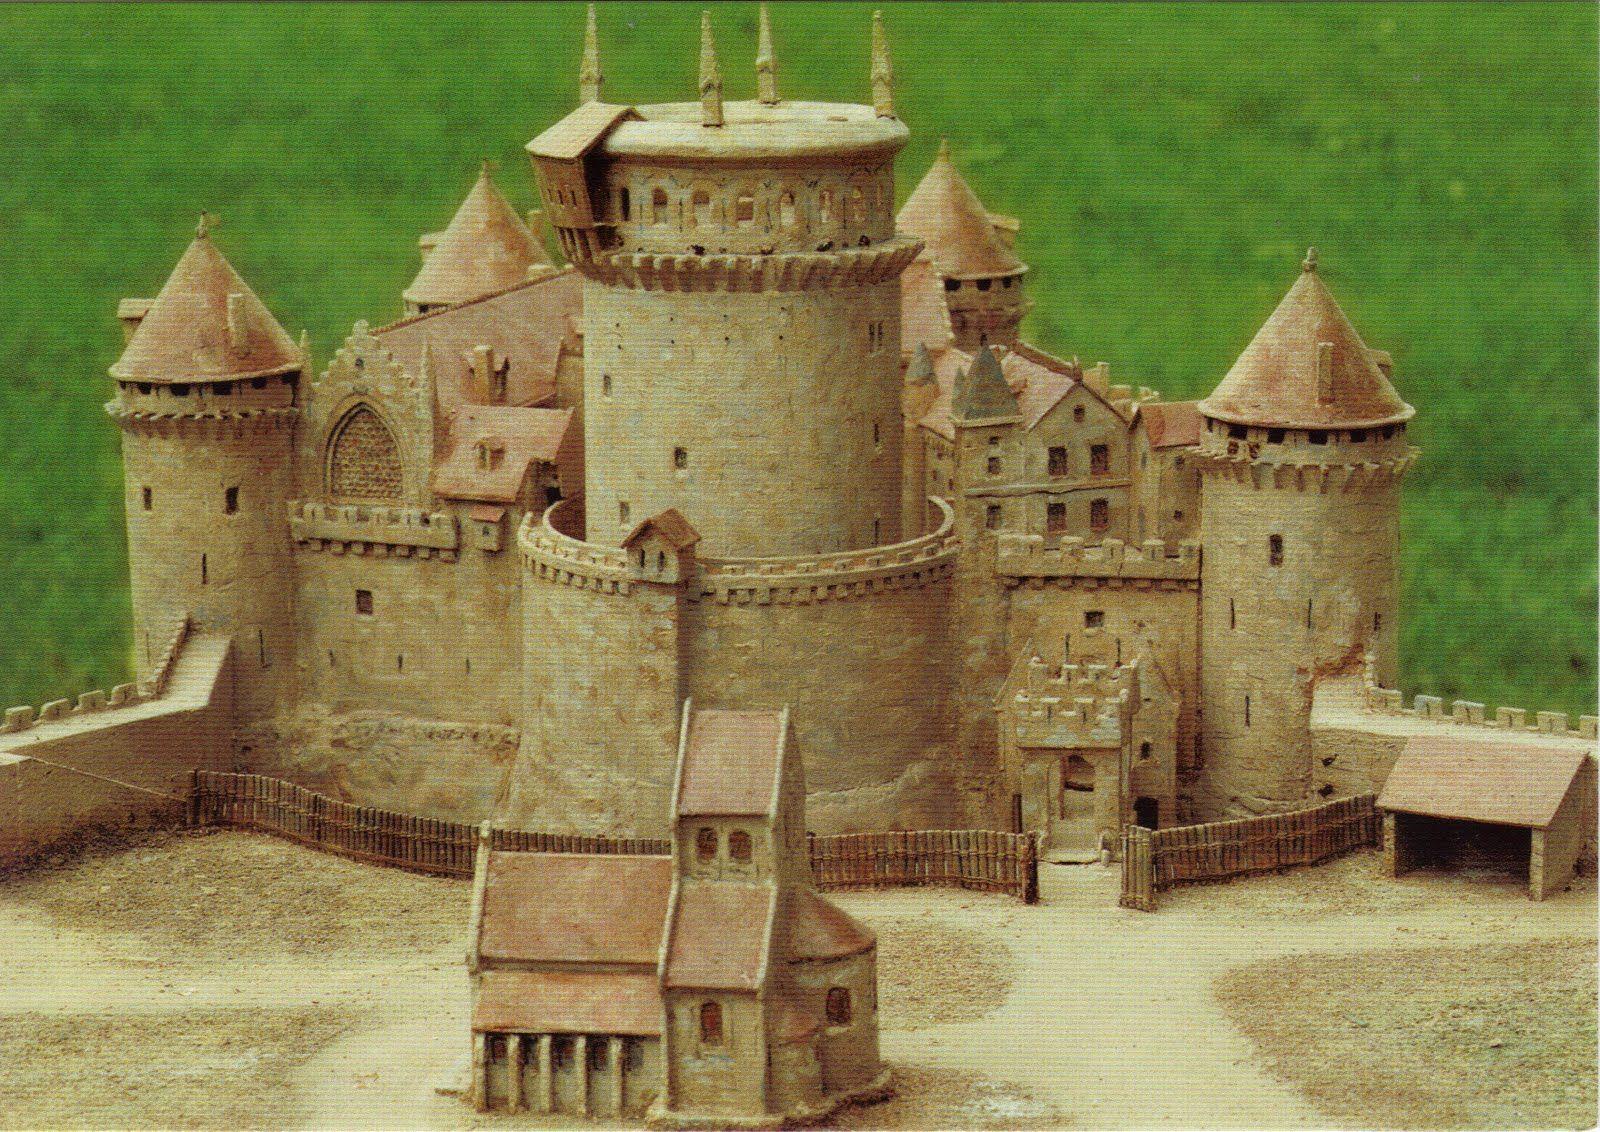 model castle - Google Search | Model castle, Medieval houses